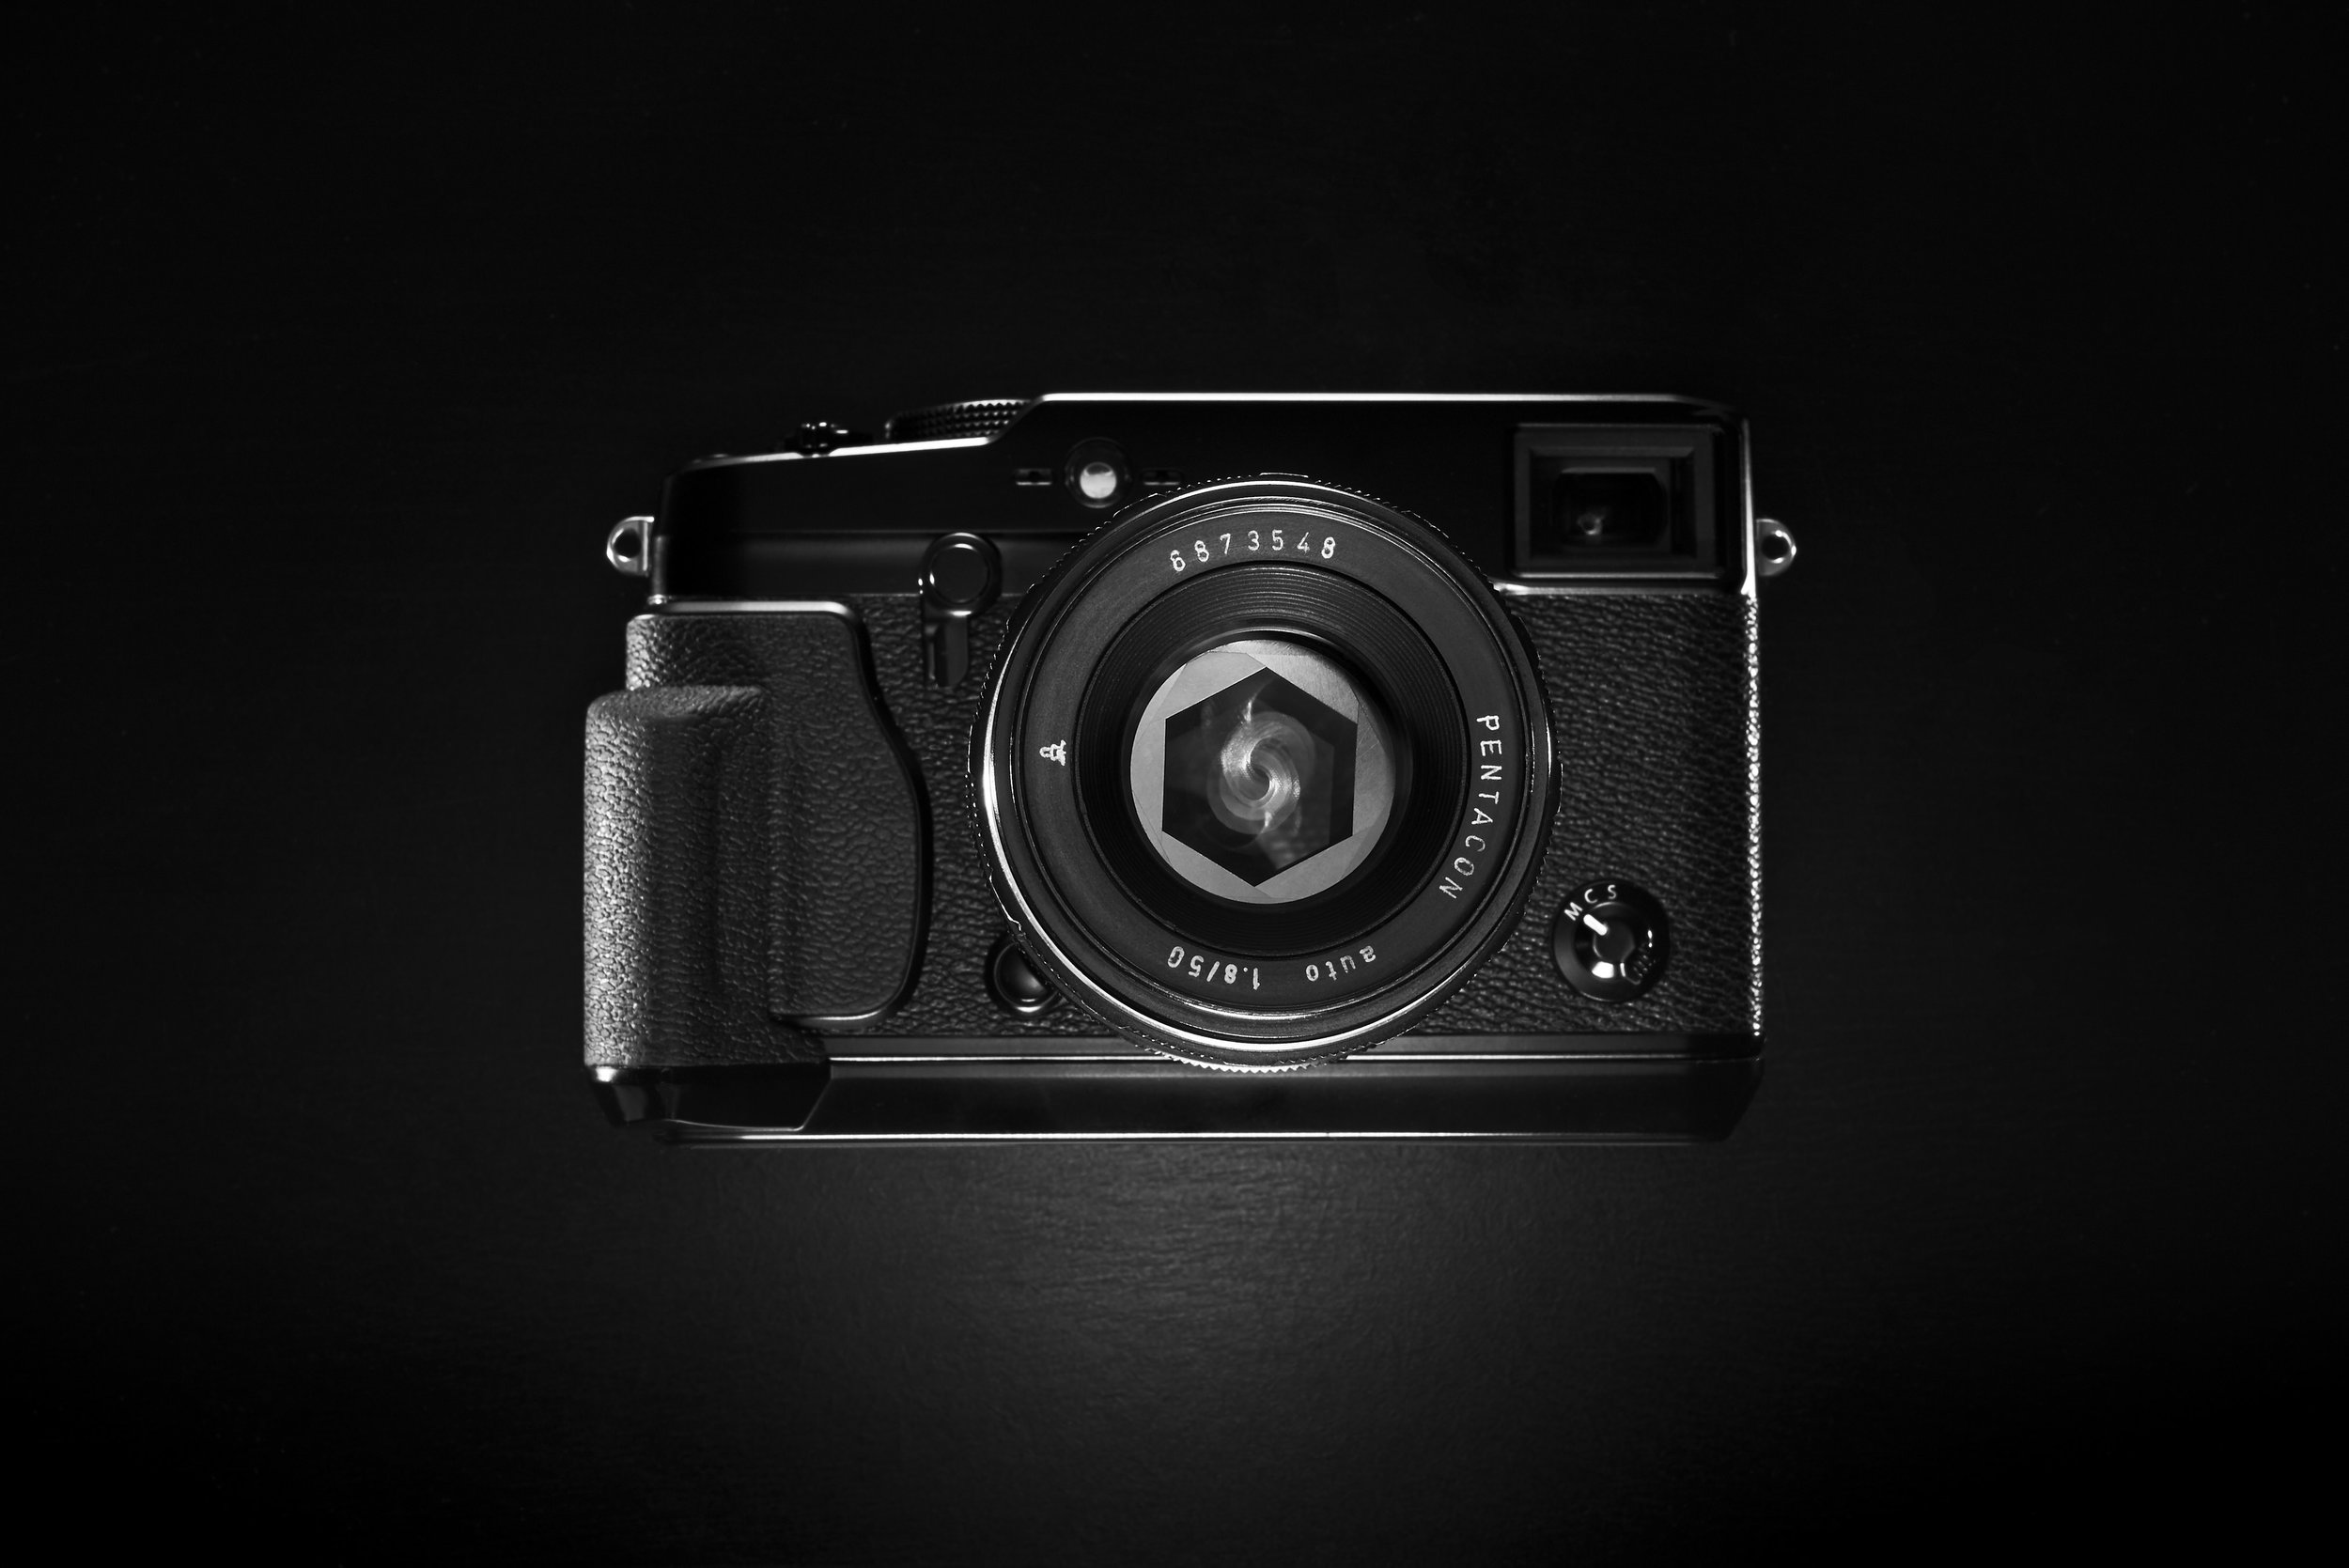 Fuji X pro 1 with Pentacon 50mm F1.8 #vintagelens #manualfocus  Photo taken on Nikon D750 FX with 40mm Voigtlander Ultron SL2, raw edit Capture one pro